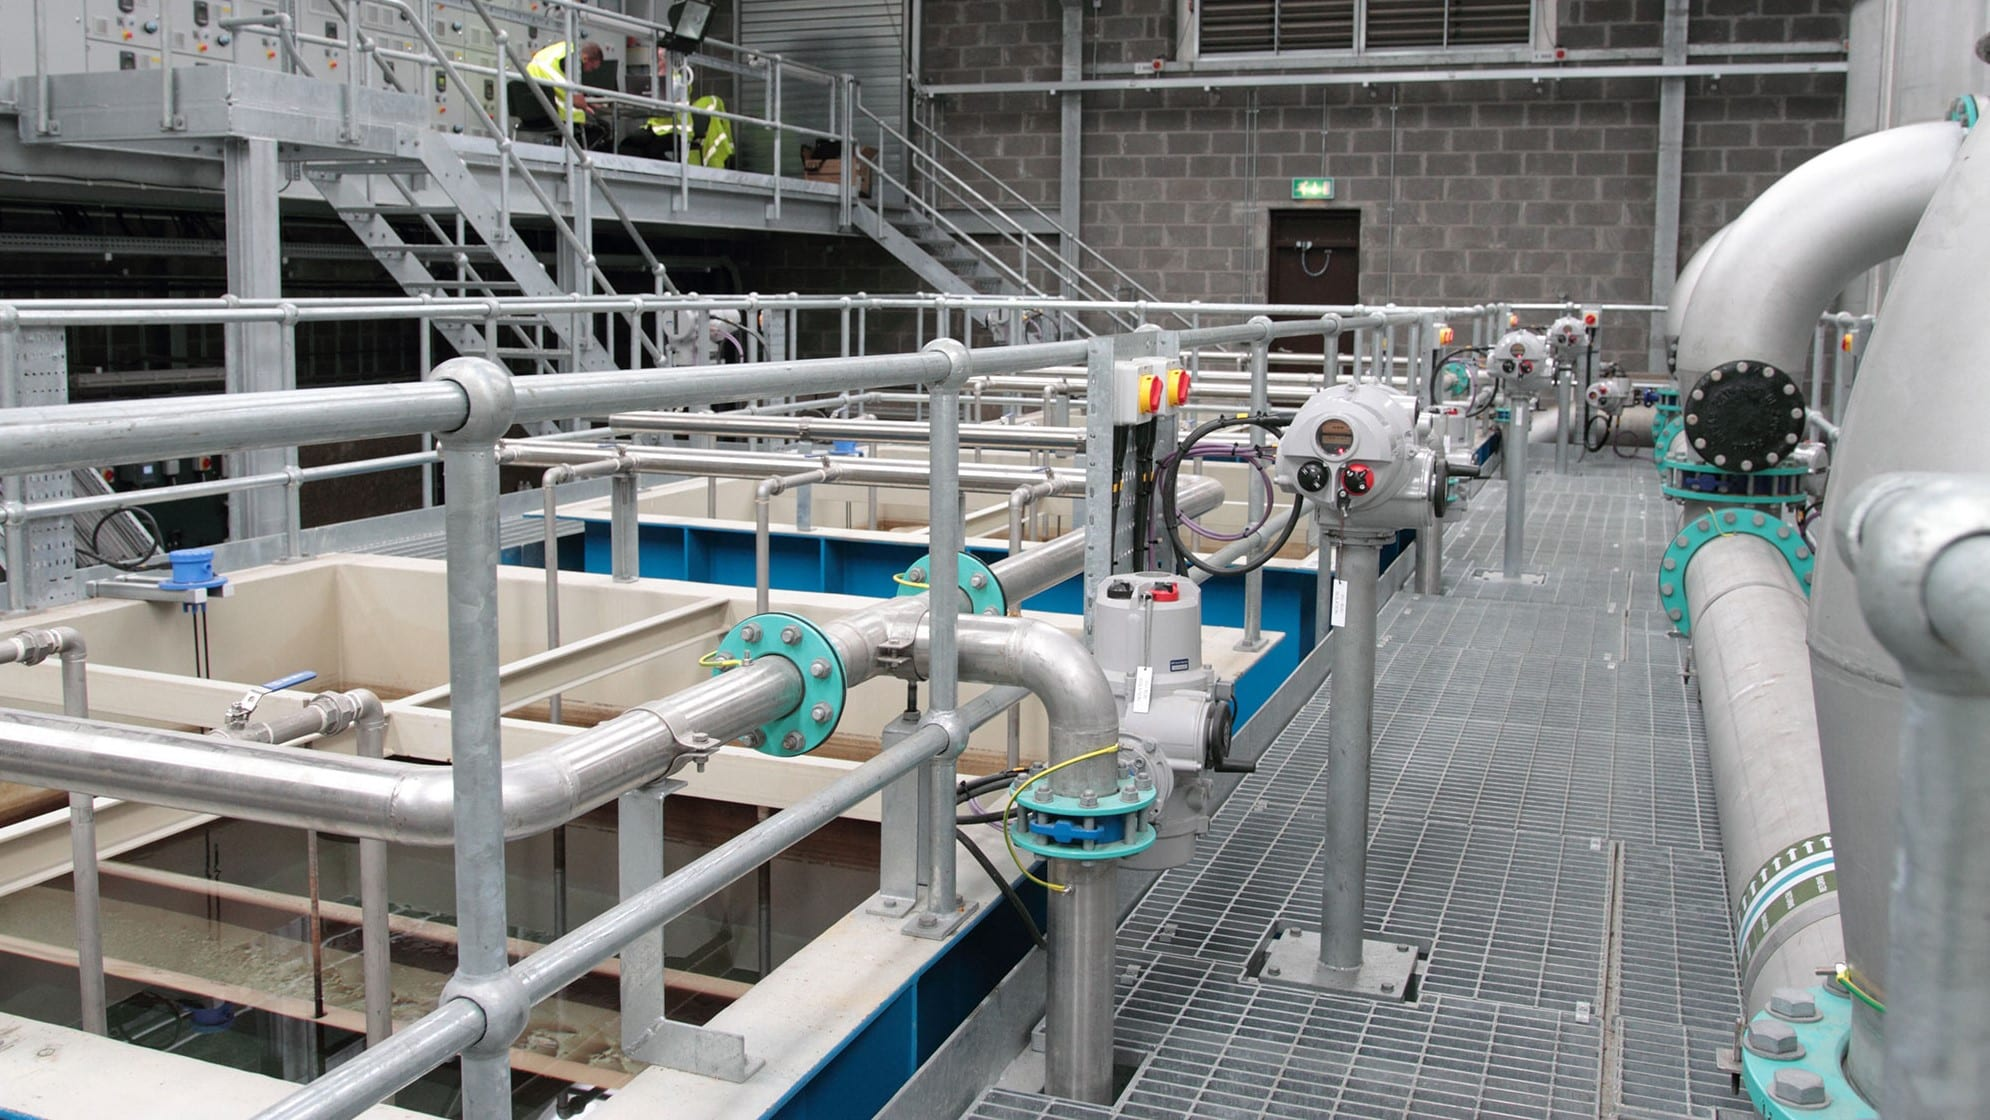 Claylake Water Treatment Works (WTW) Image